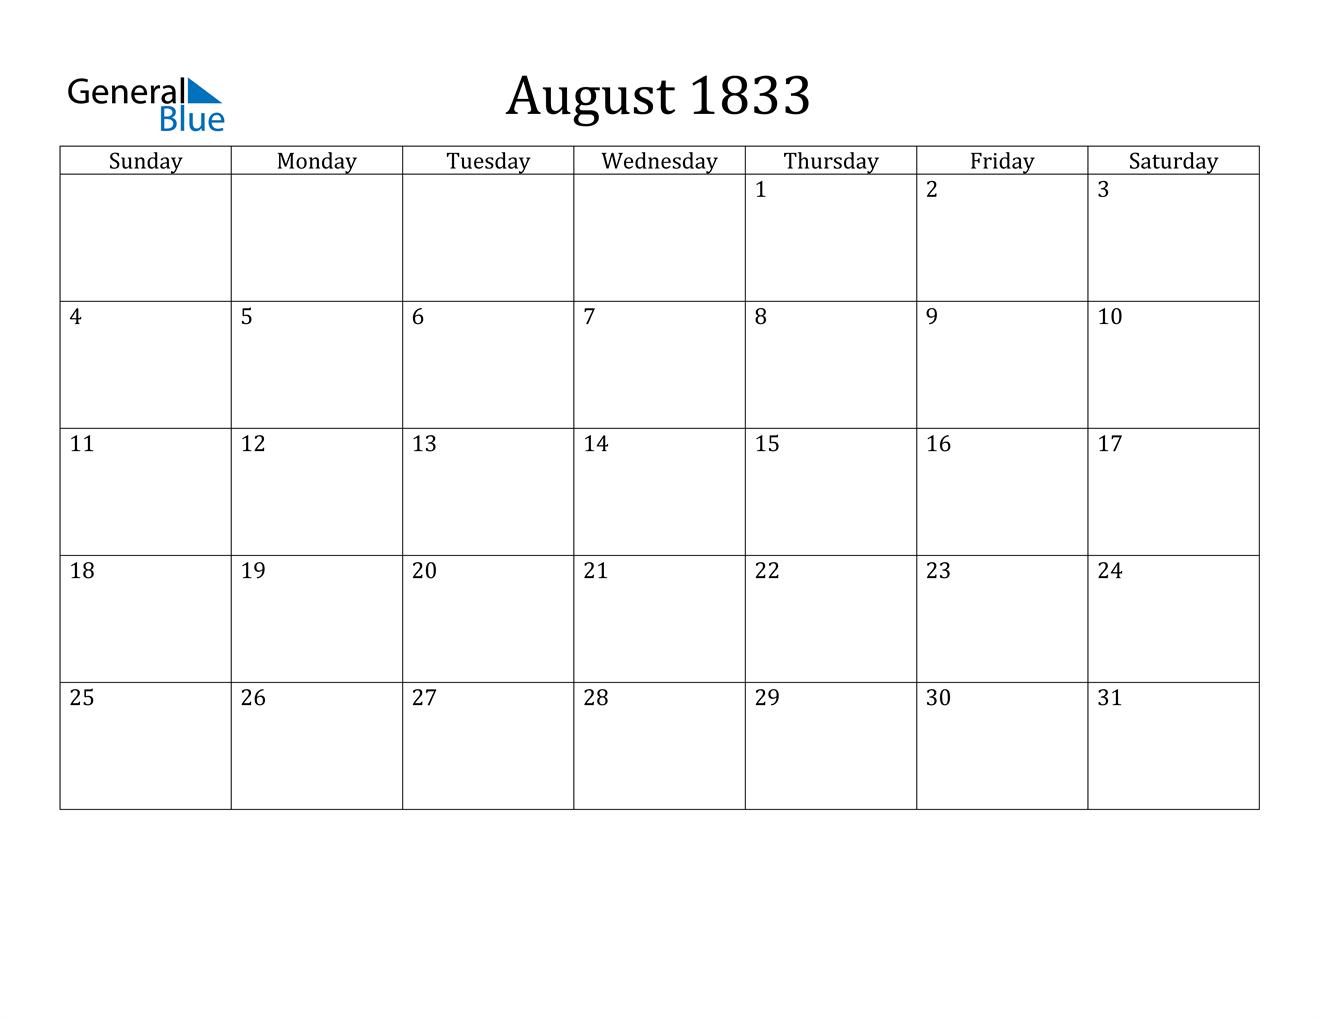 Image of August 1833 Calendar